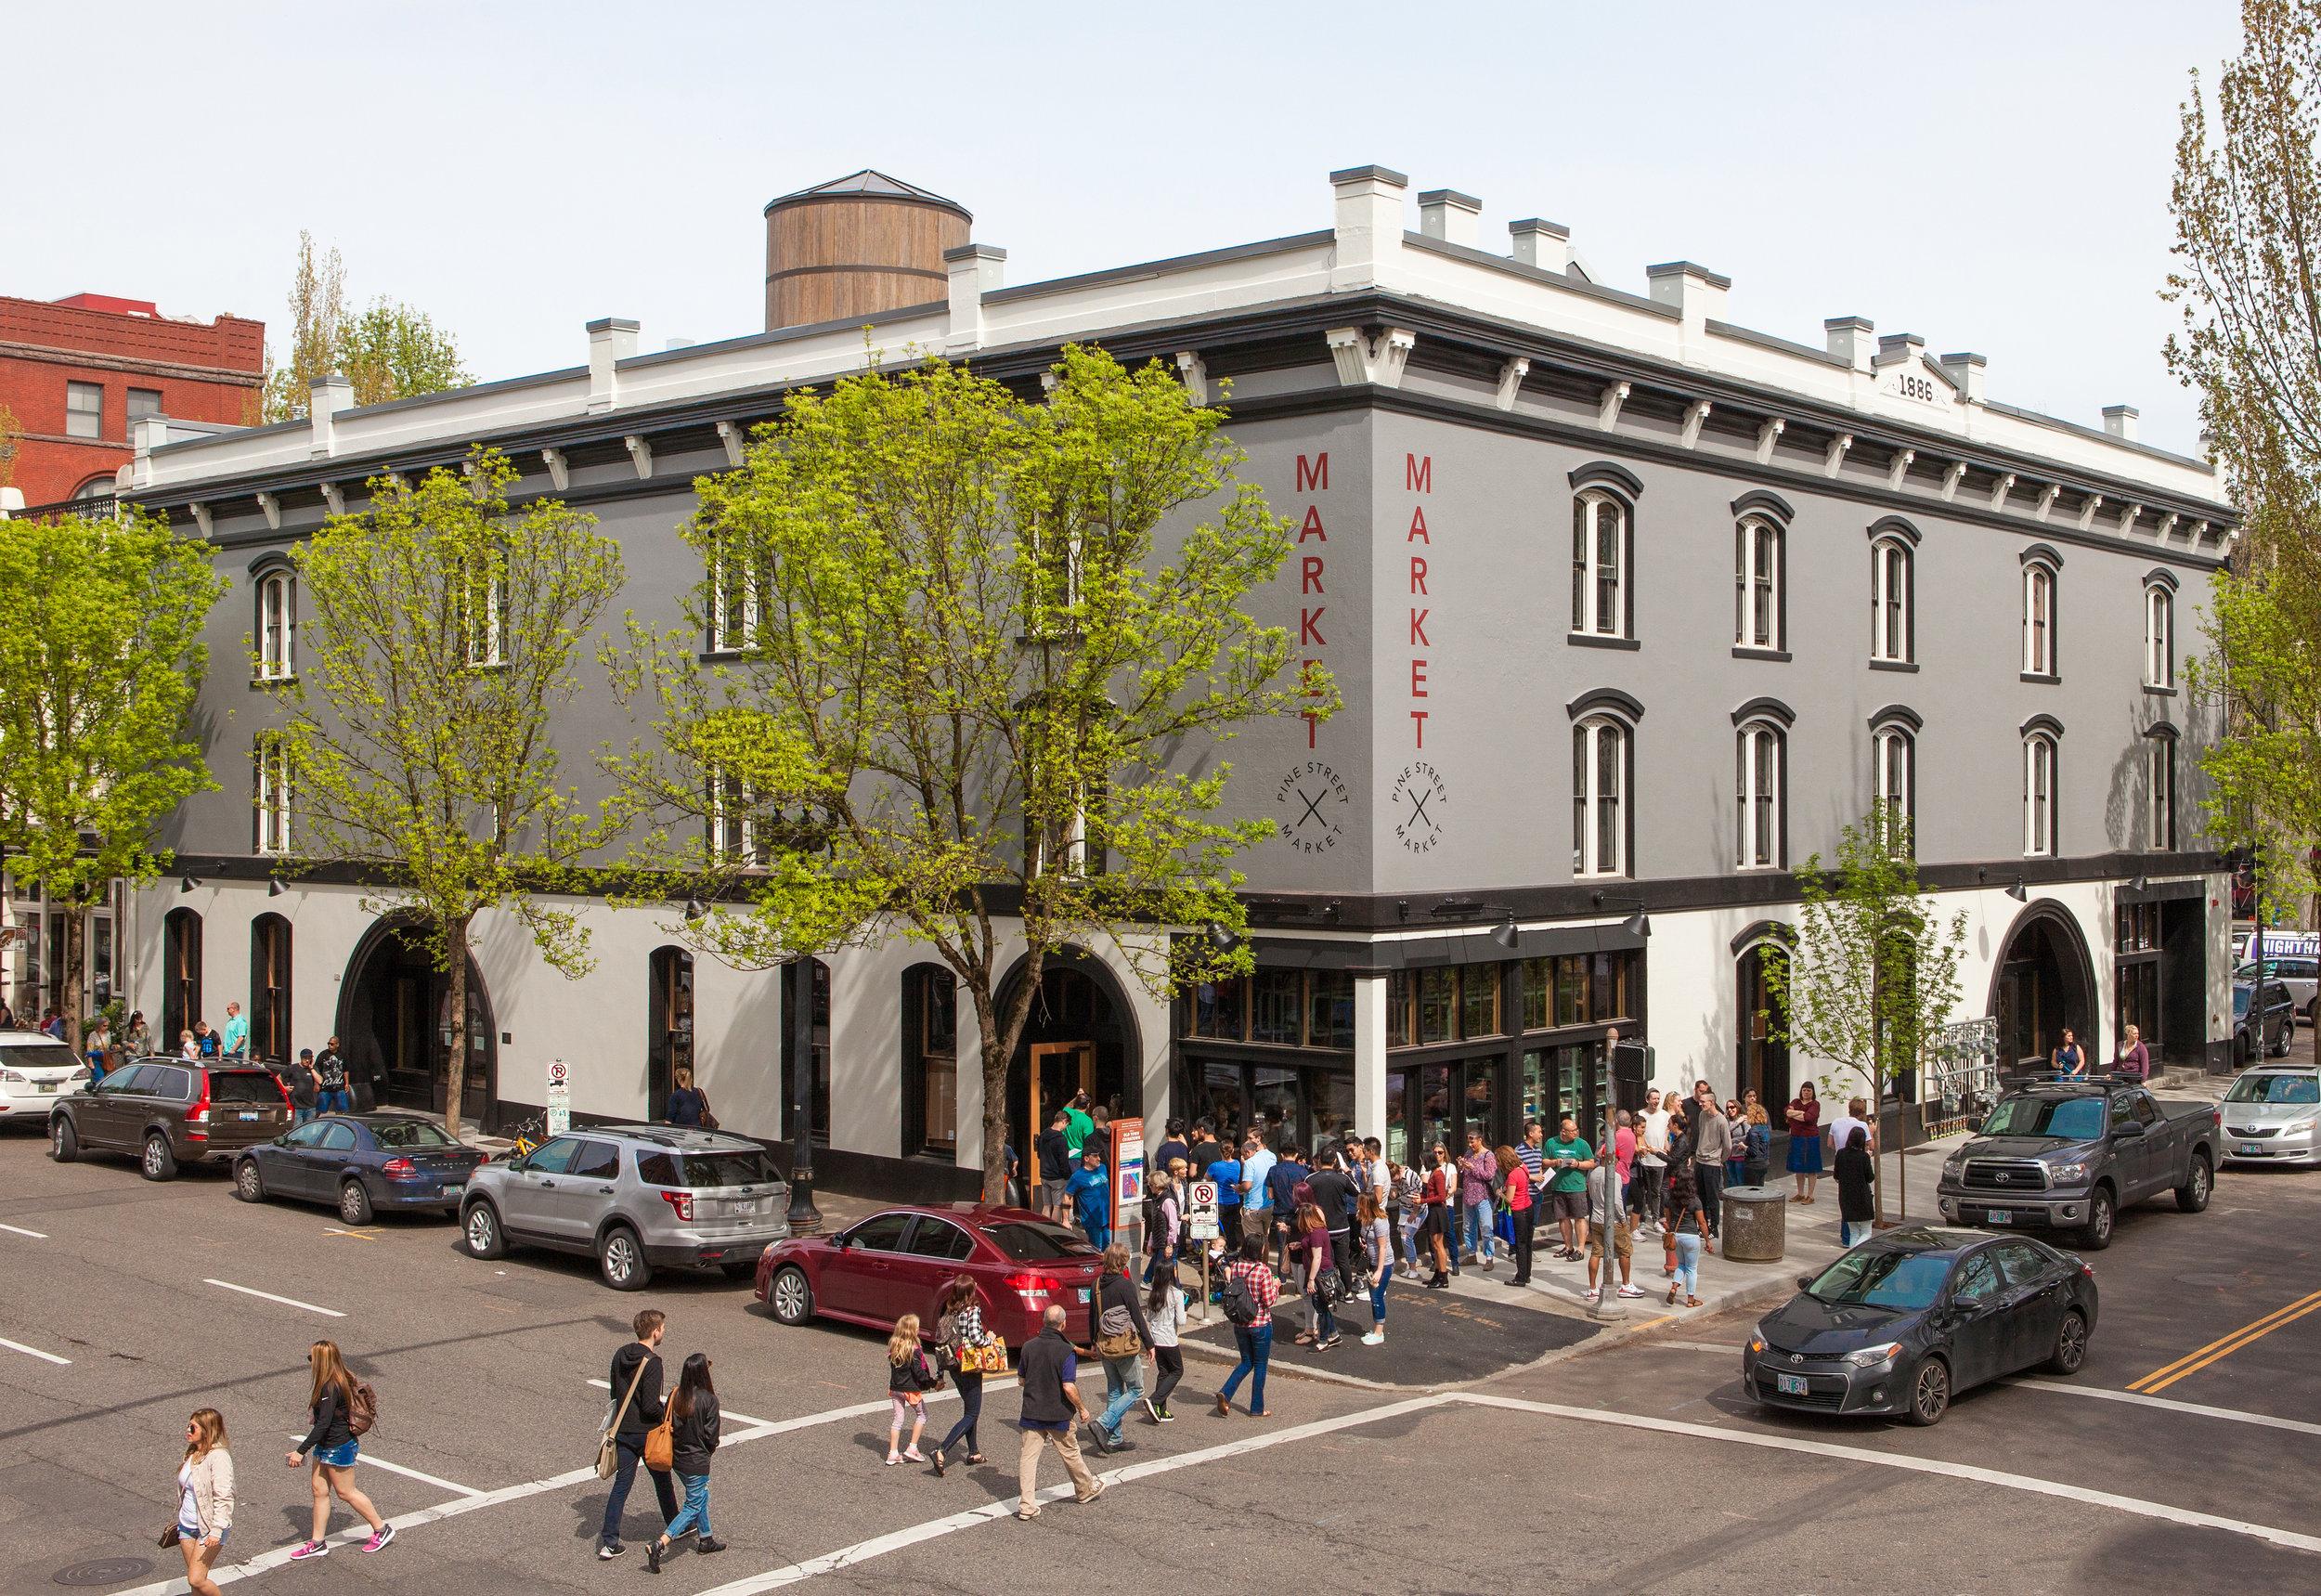 Pine St. Market - Exterior - After Construction 2 by Alan Weiner.jpg